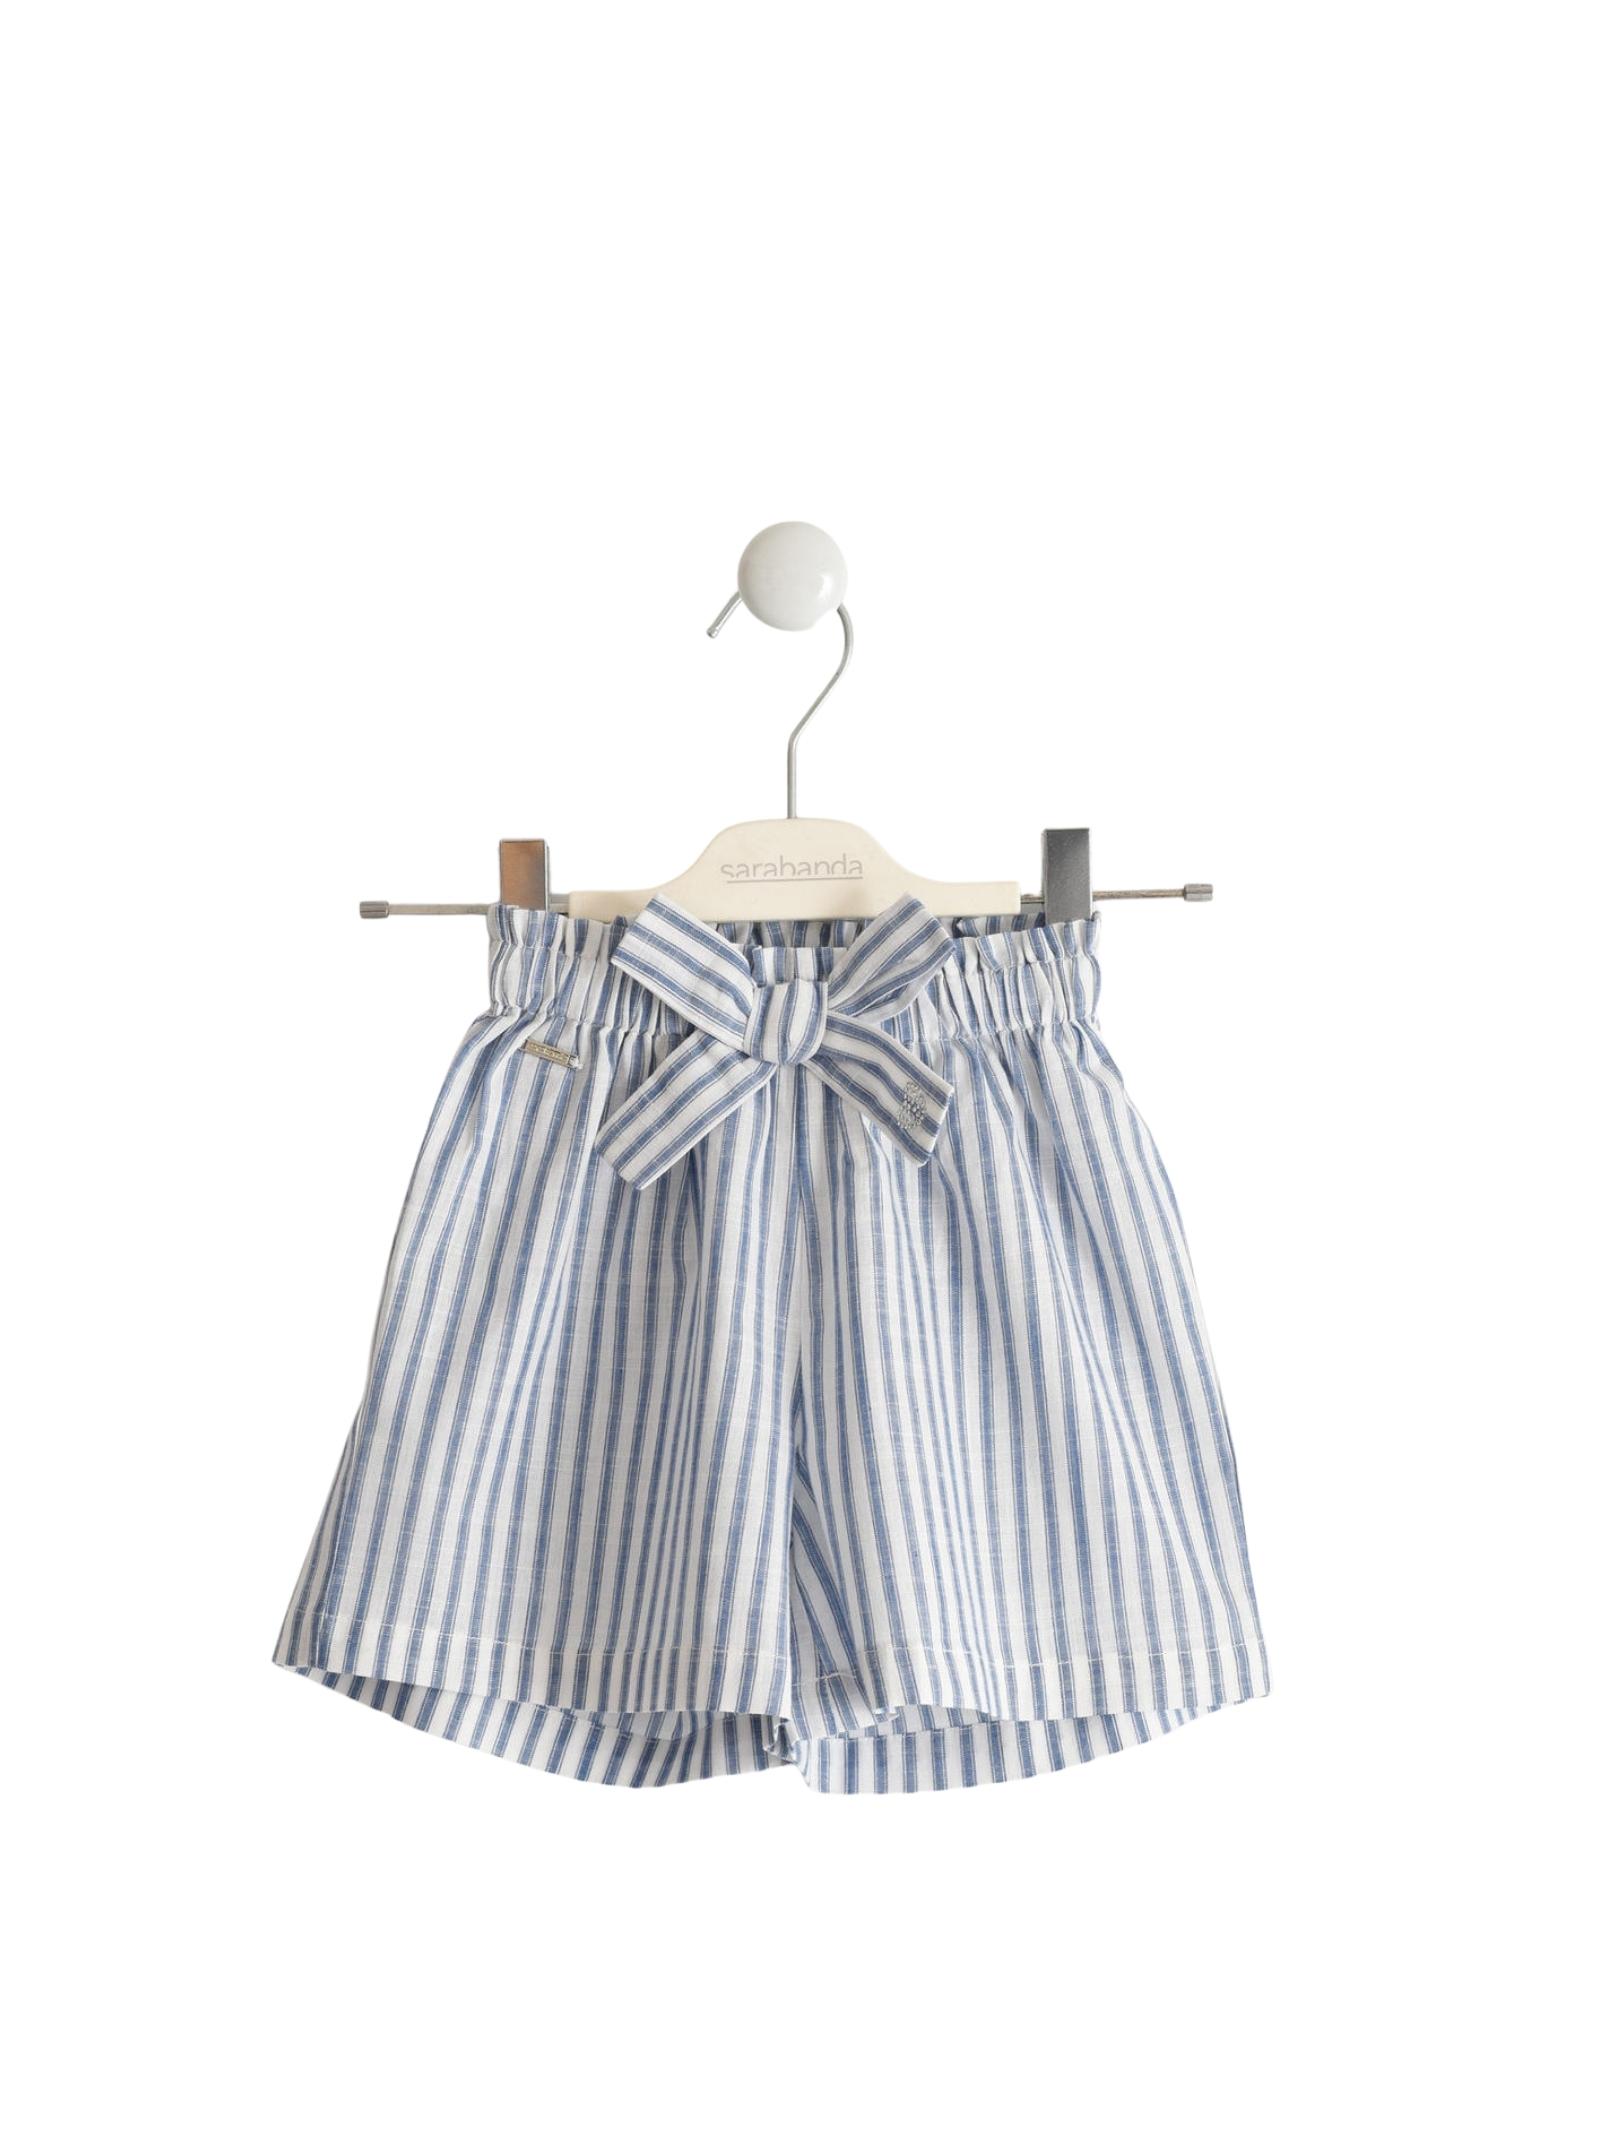 SARABANDA | Trousers | 02593008020